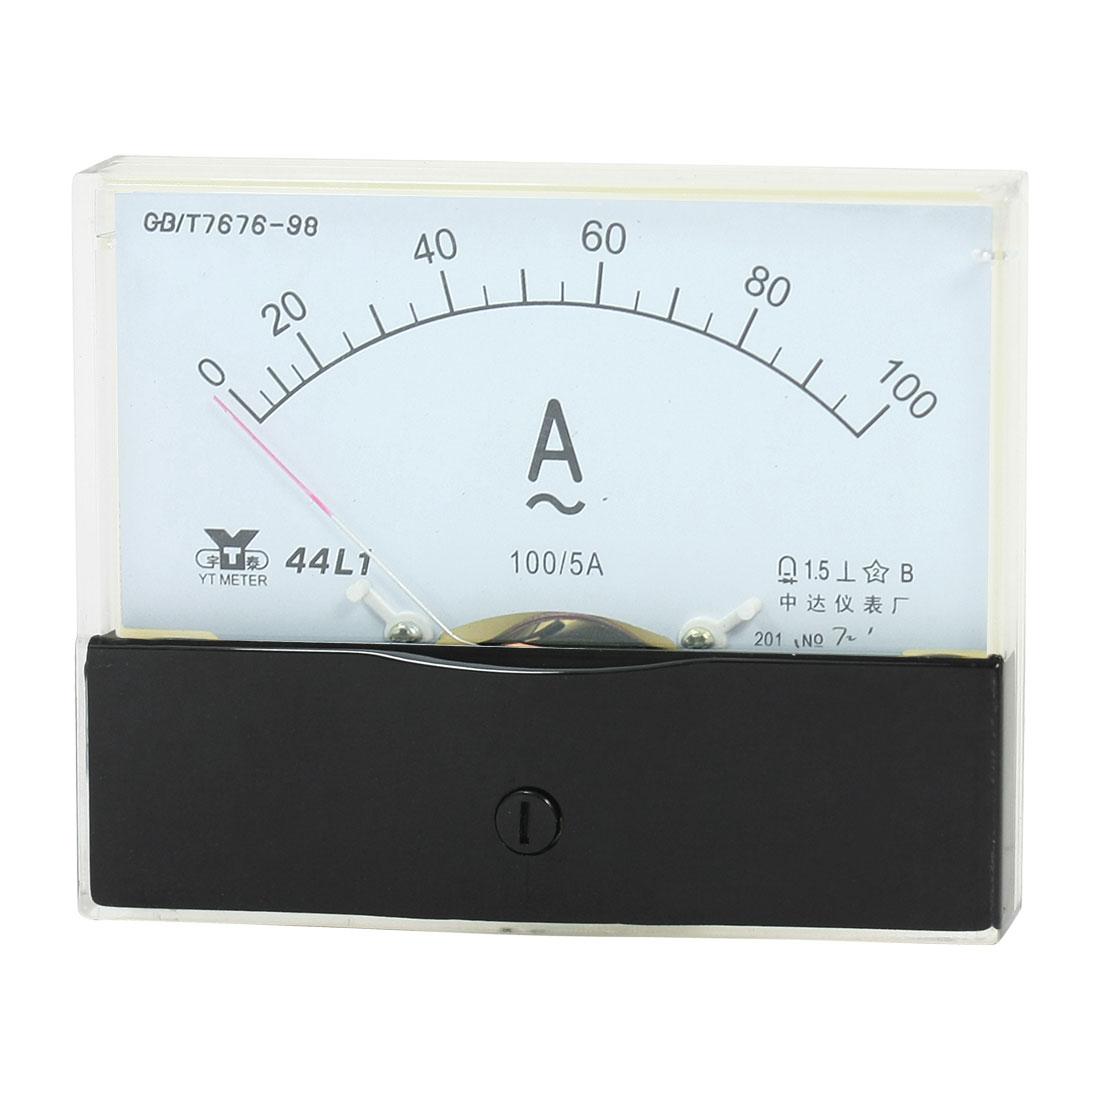 Measurement Tool Panel Mount Analog Ammeter Gauge AC 0 - 100A Measuring Range 44L1